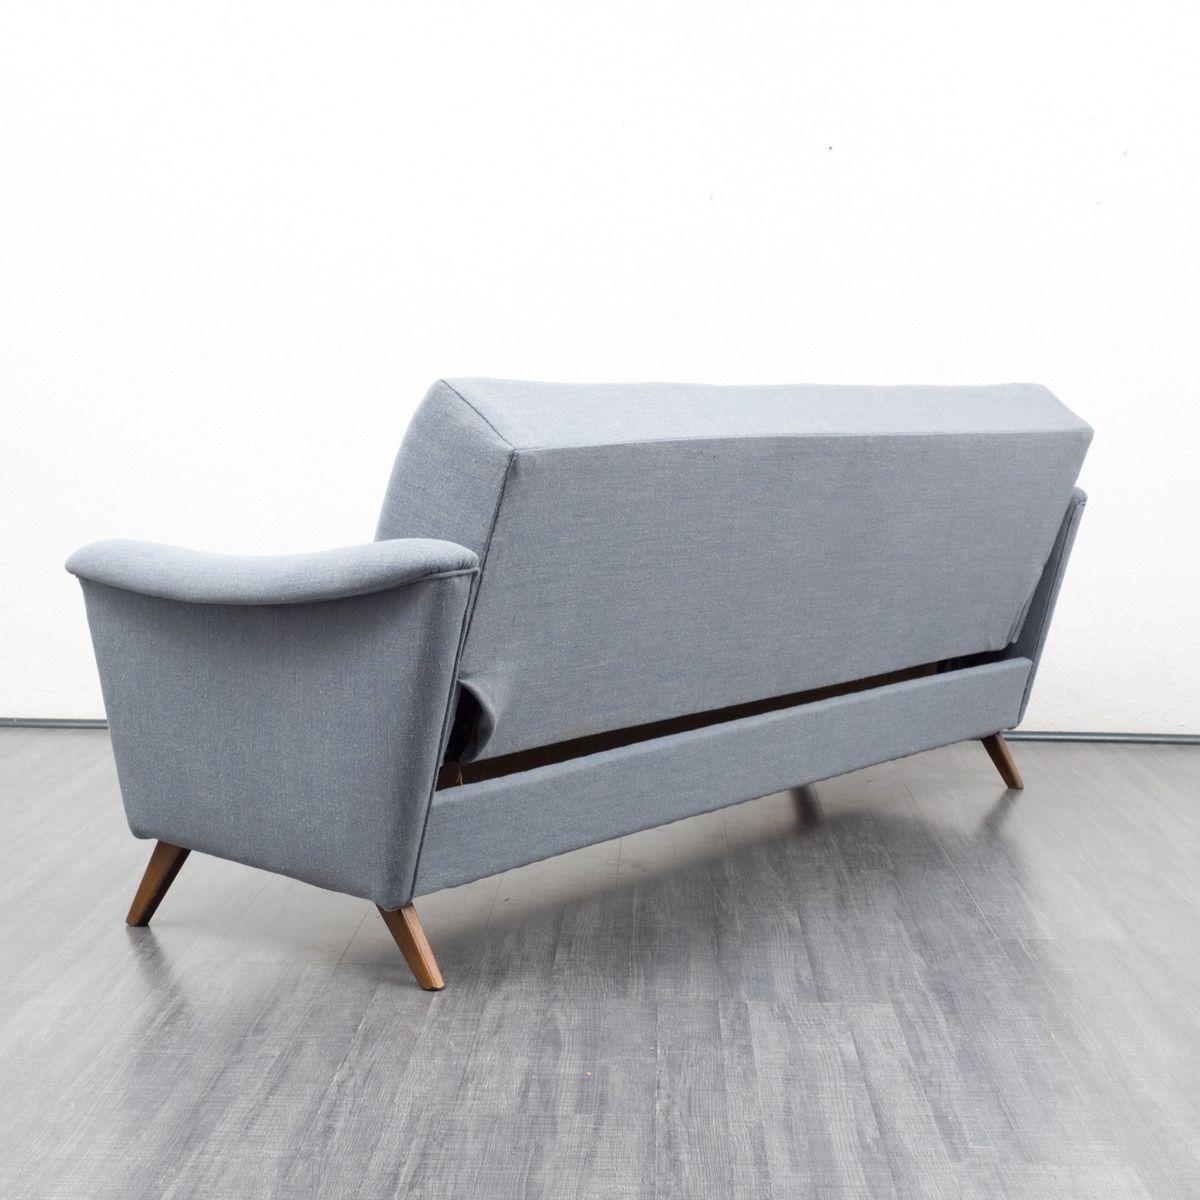 blaues vintage schlafsofa 1950er bei pamono kaufen. Black Bedroom Furniture Sets. Home Design Ideas